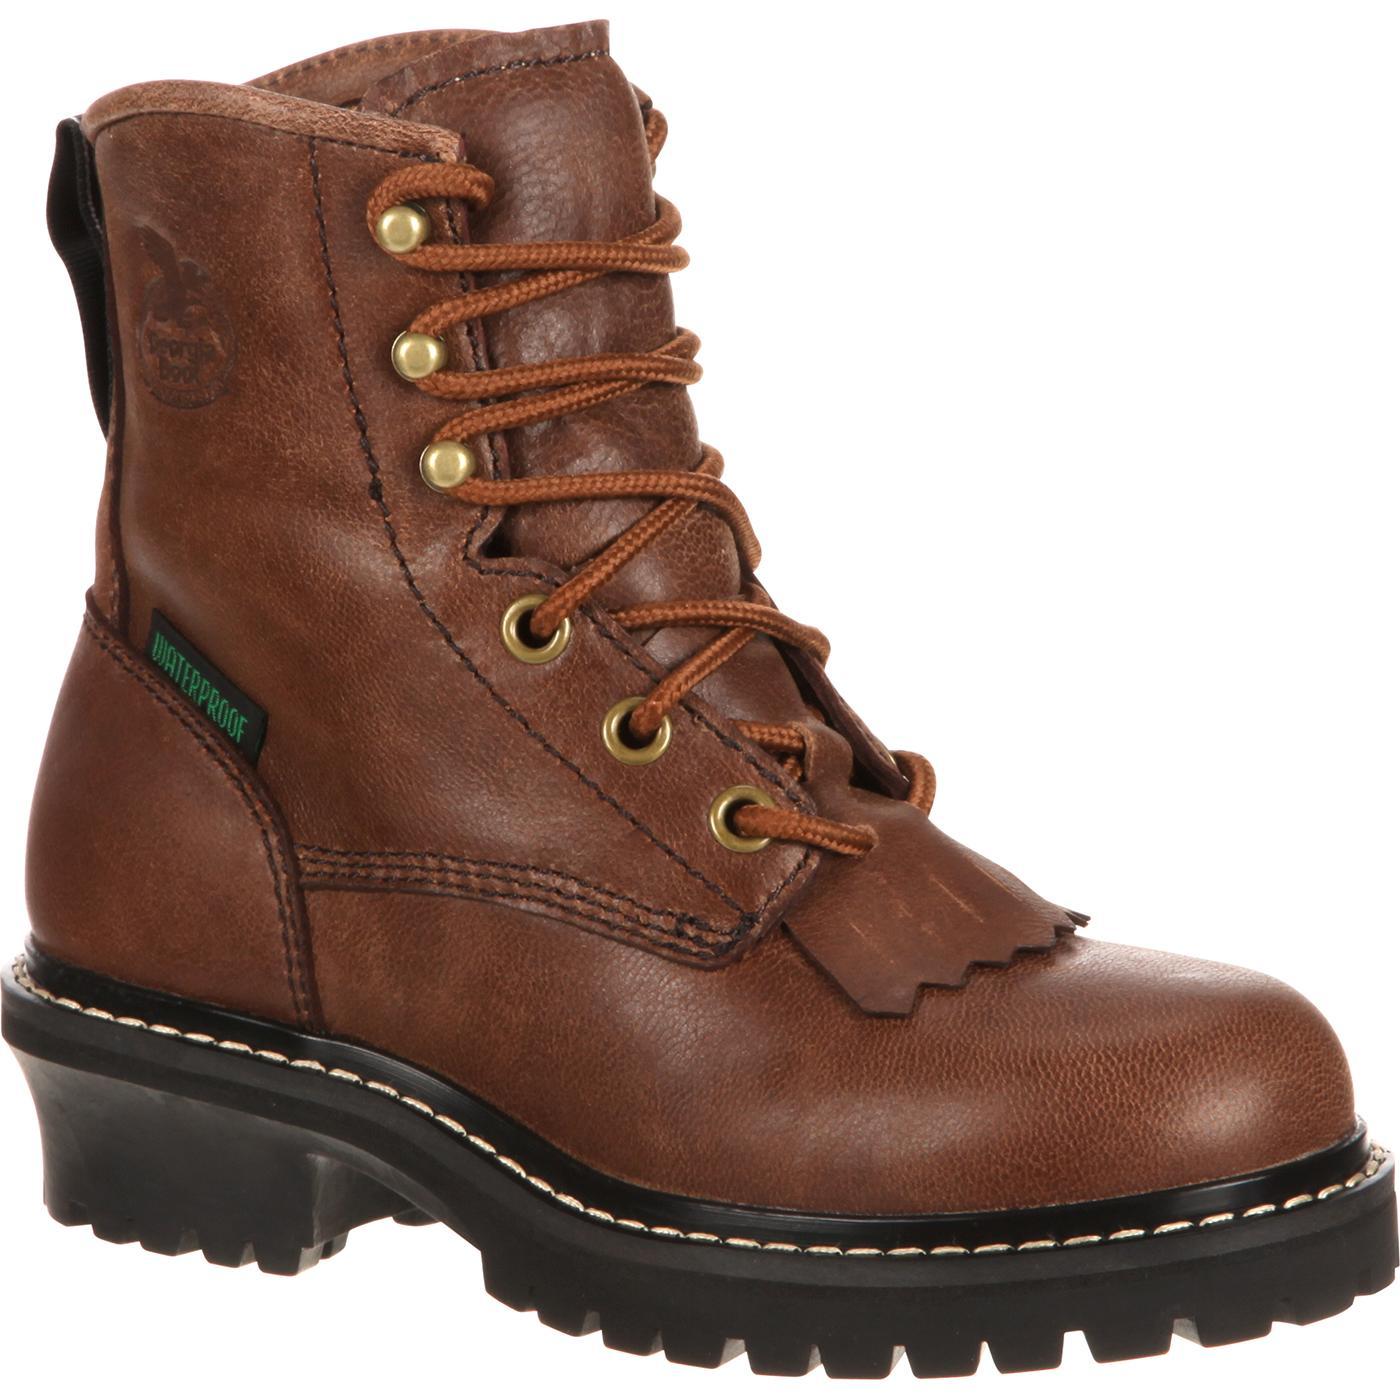 4b3f3472e29 Georgia Boot Little Kids' Waterproof Logger